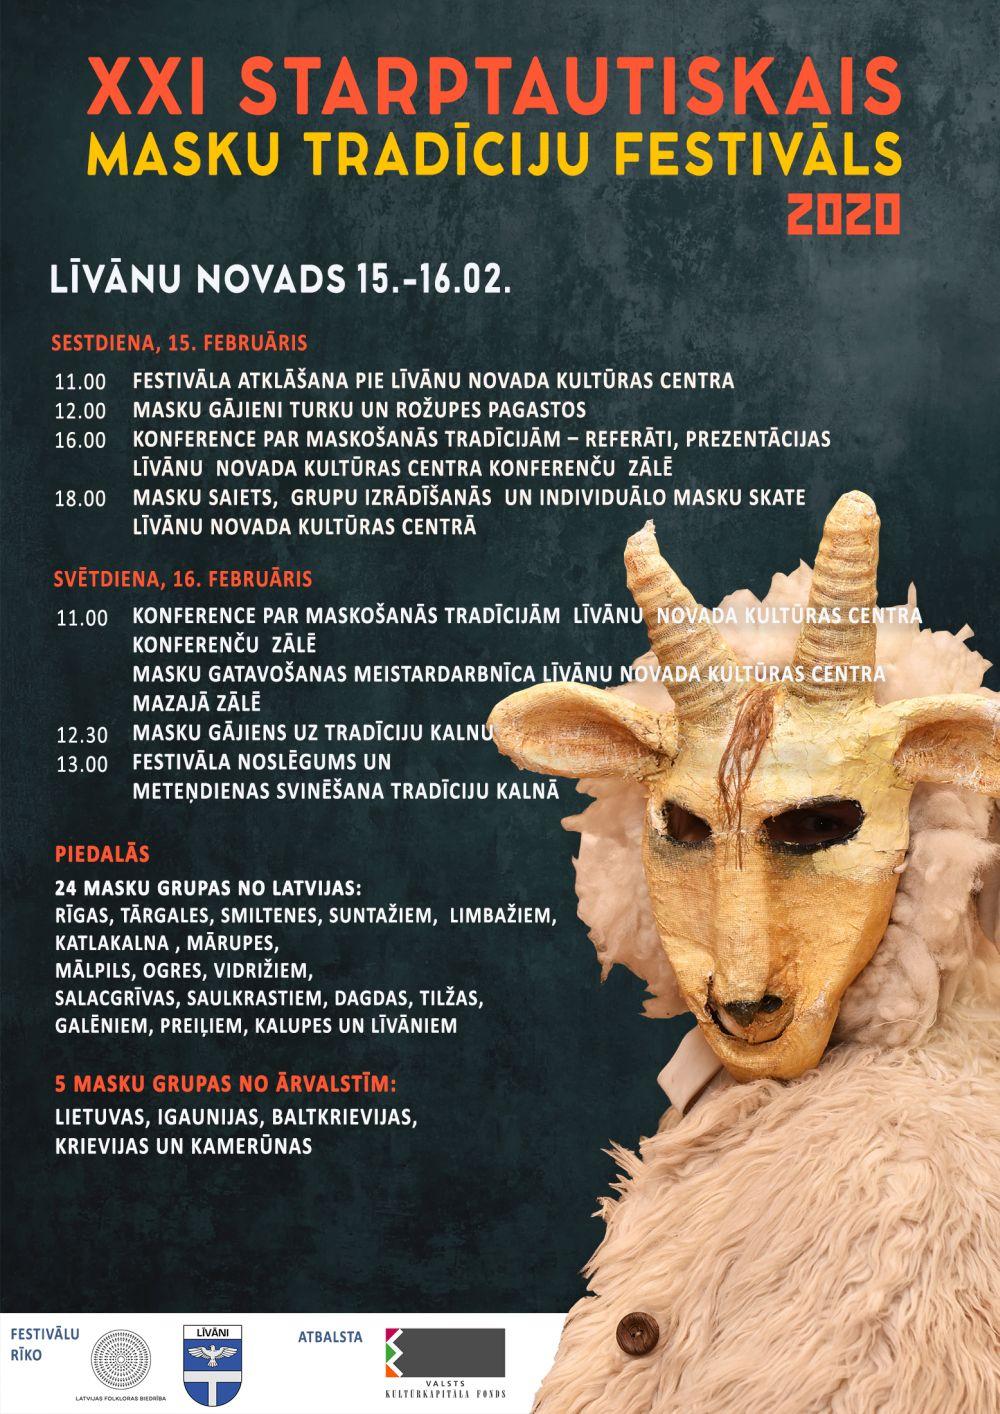 Masku festivals @ Leivuona nūvods